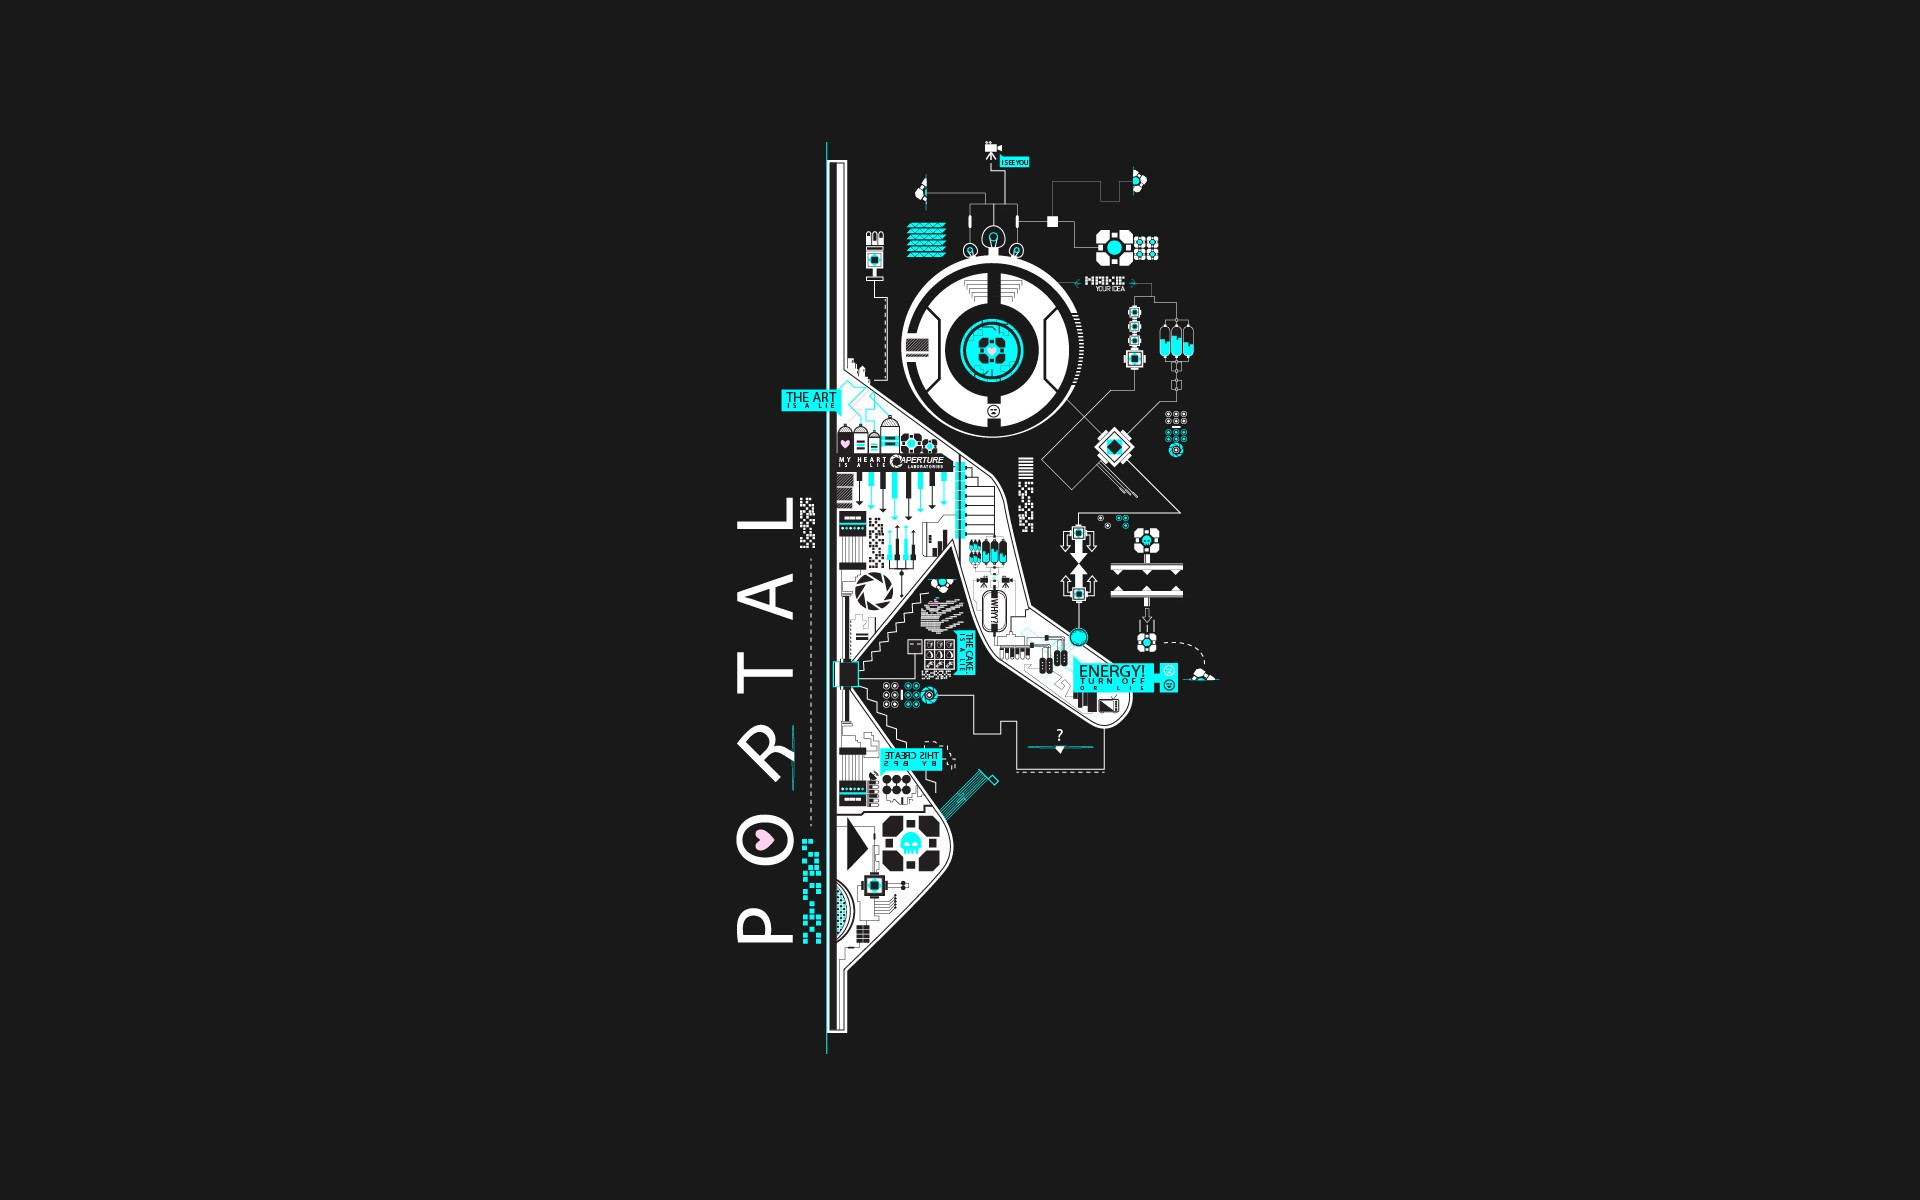 Portal Wallpaper ·① Download Free Stunning HD Backgrounds